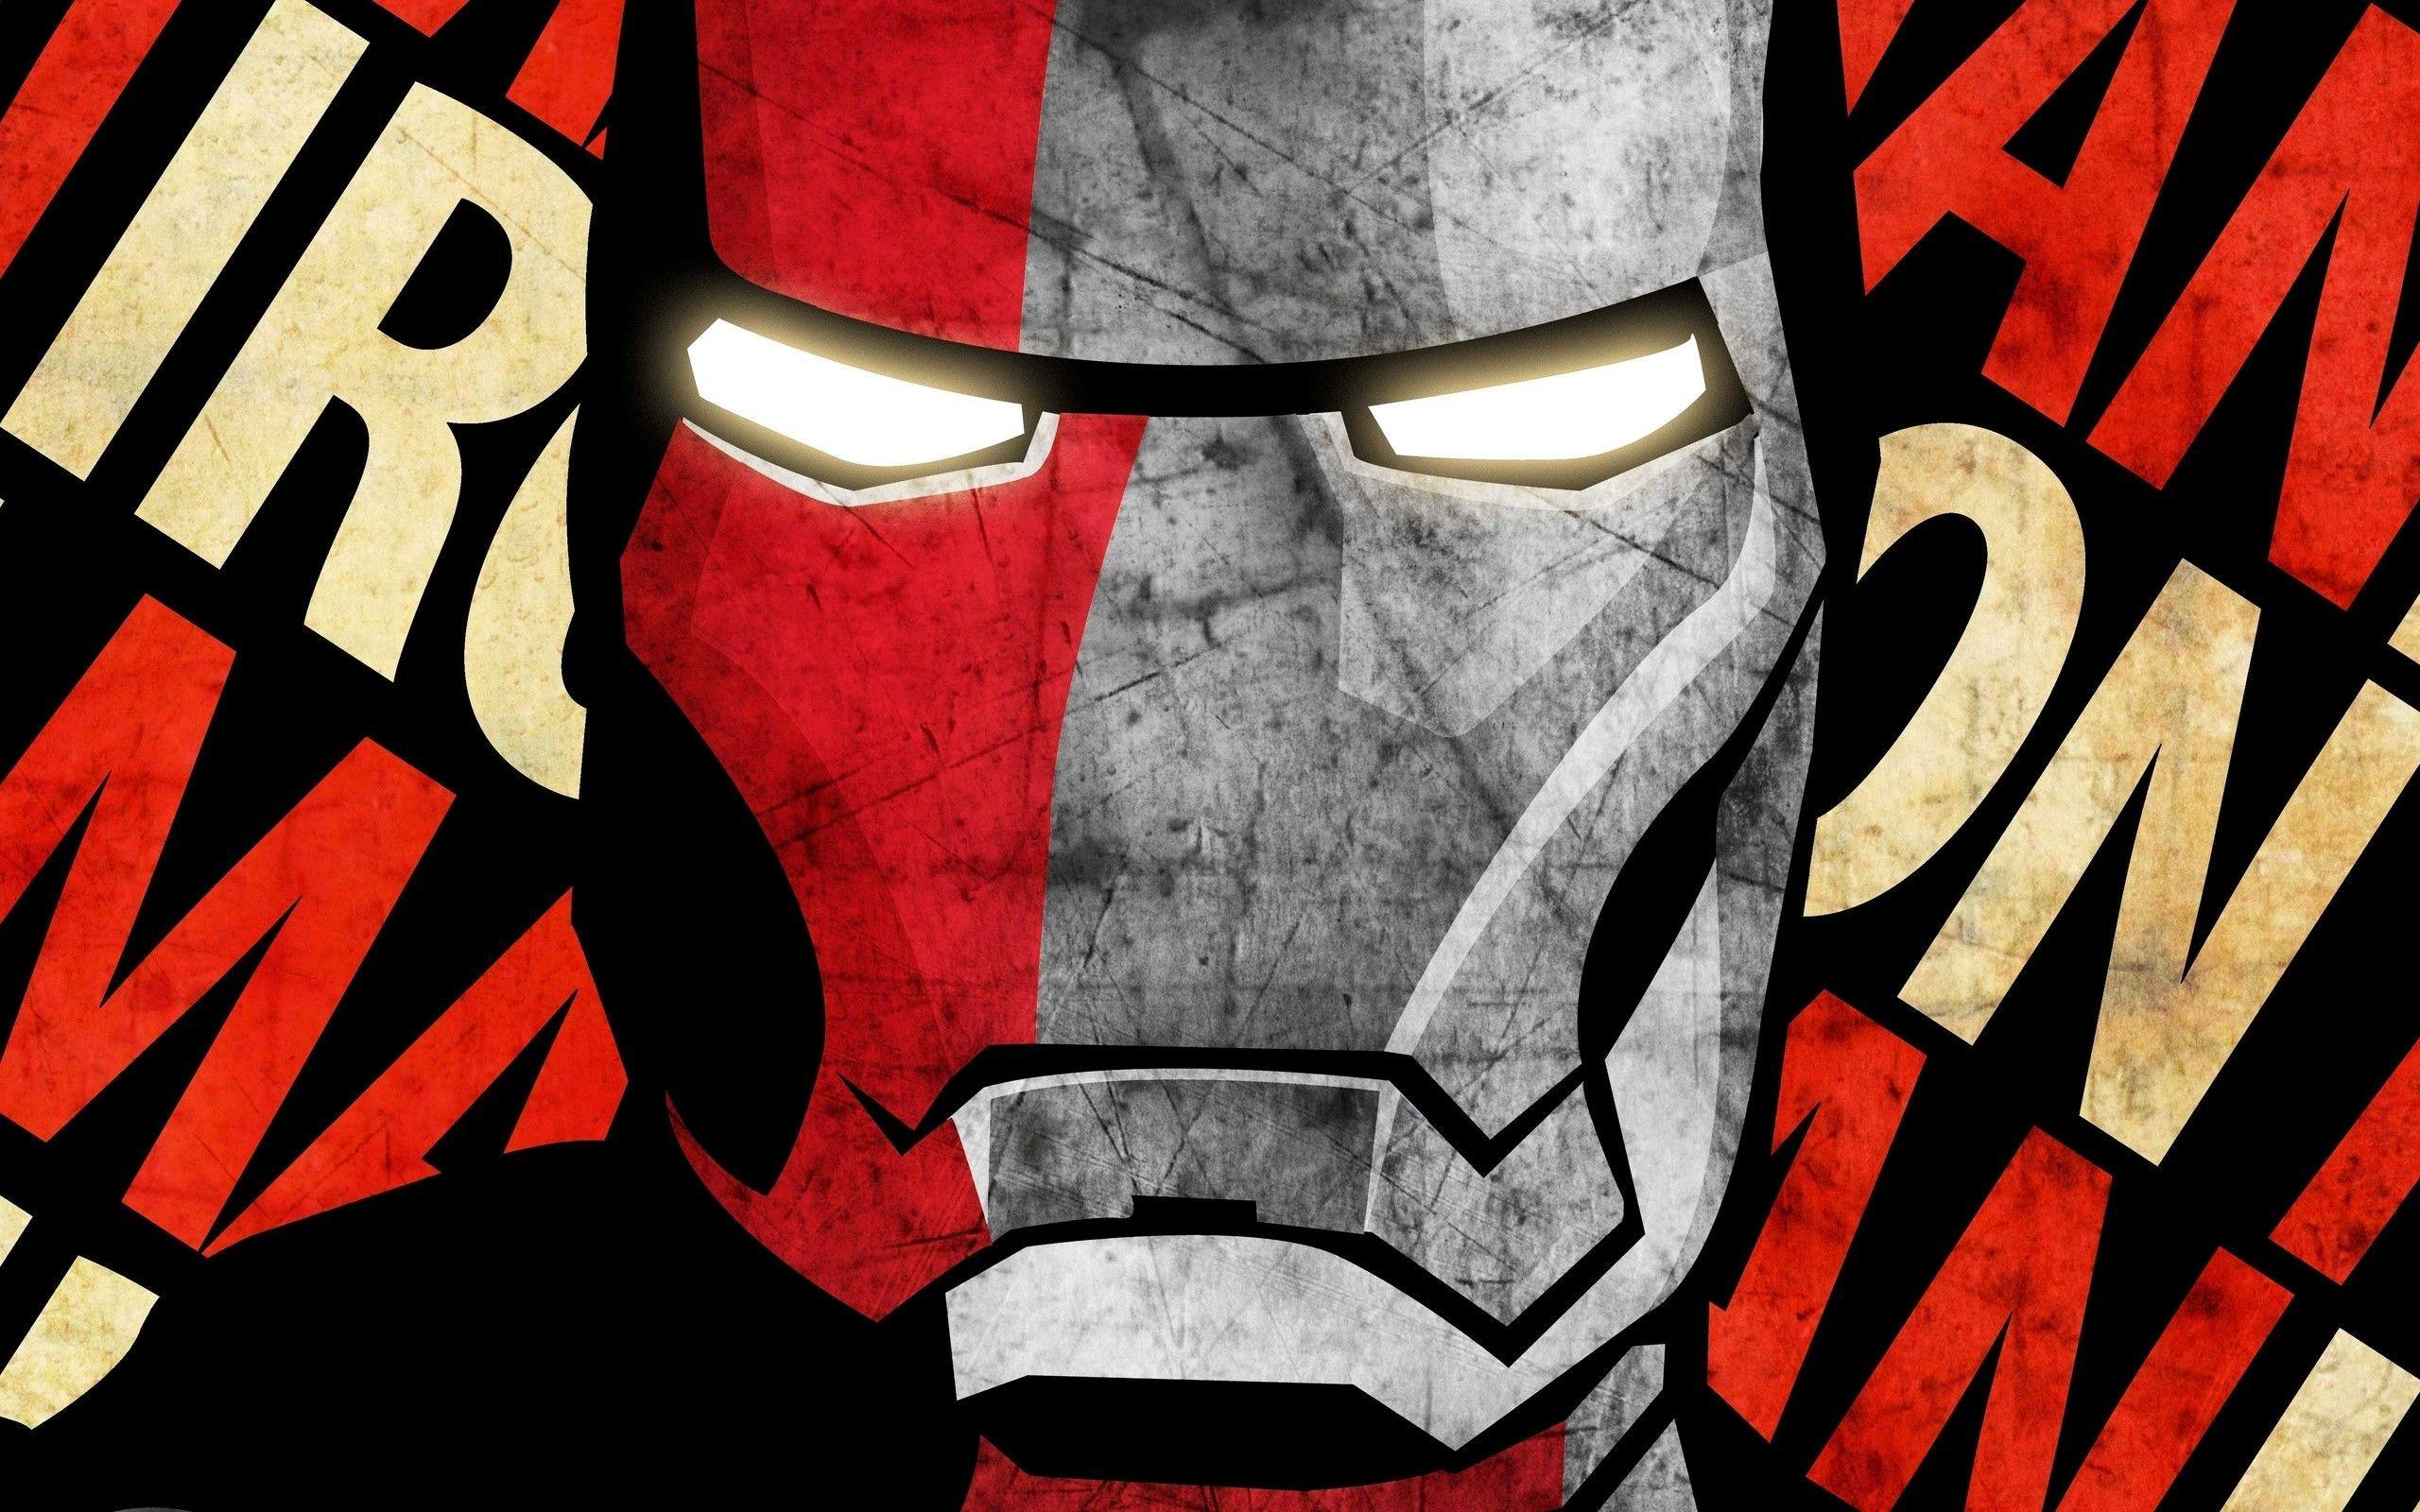 Download Iron Man Wallpaper - HD Wallpaper Collection - HD ...